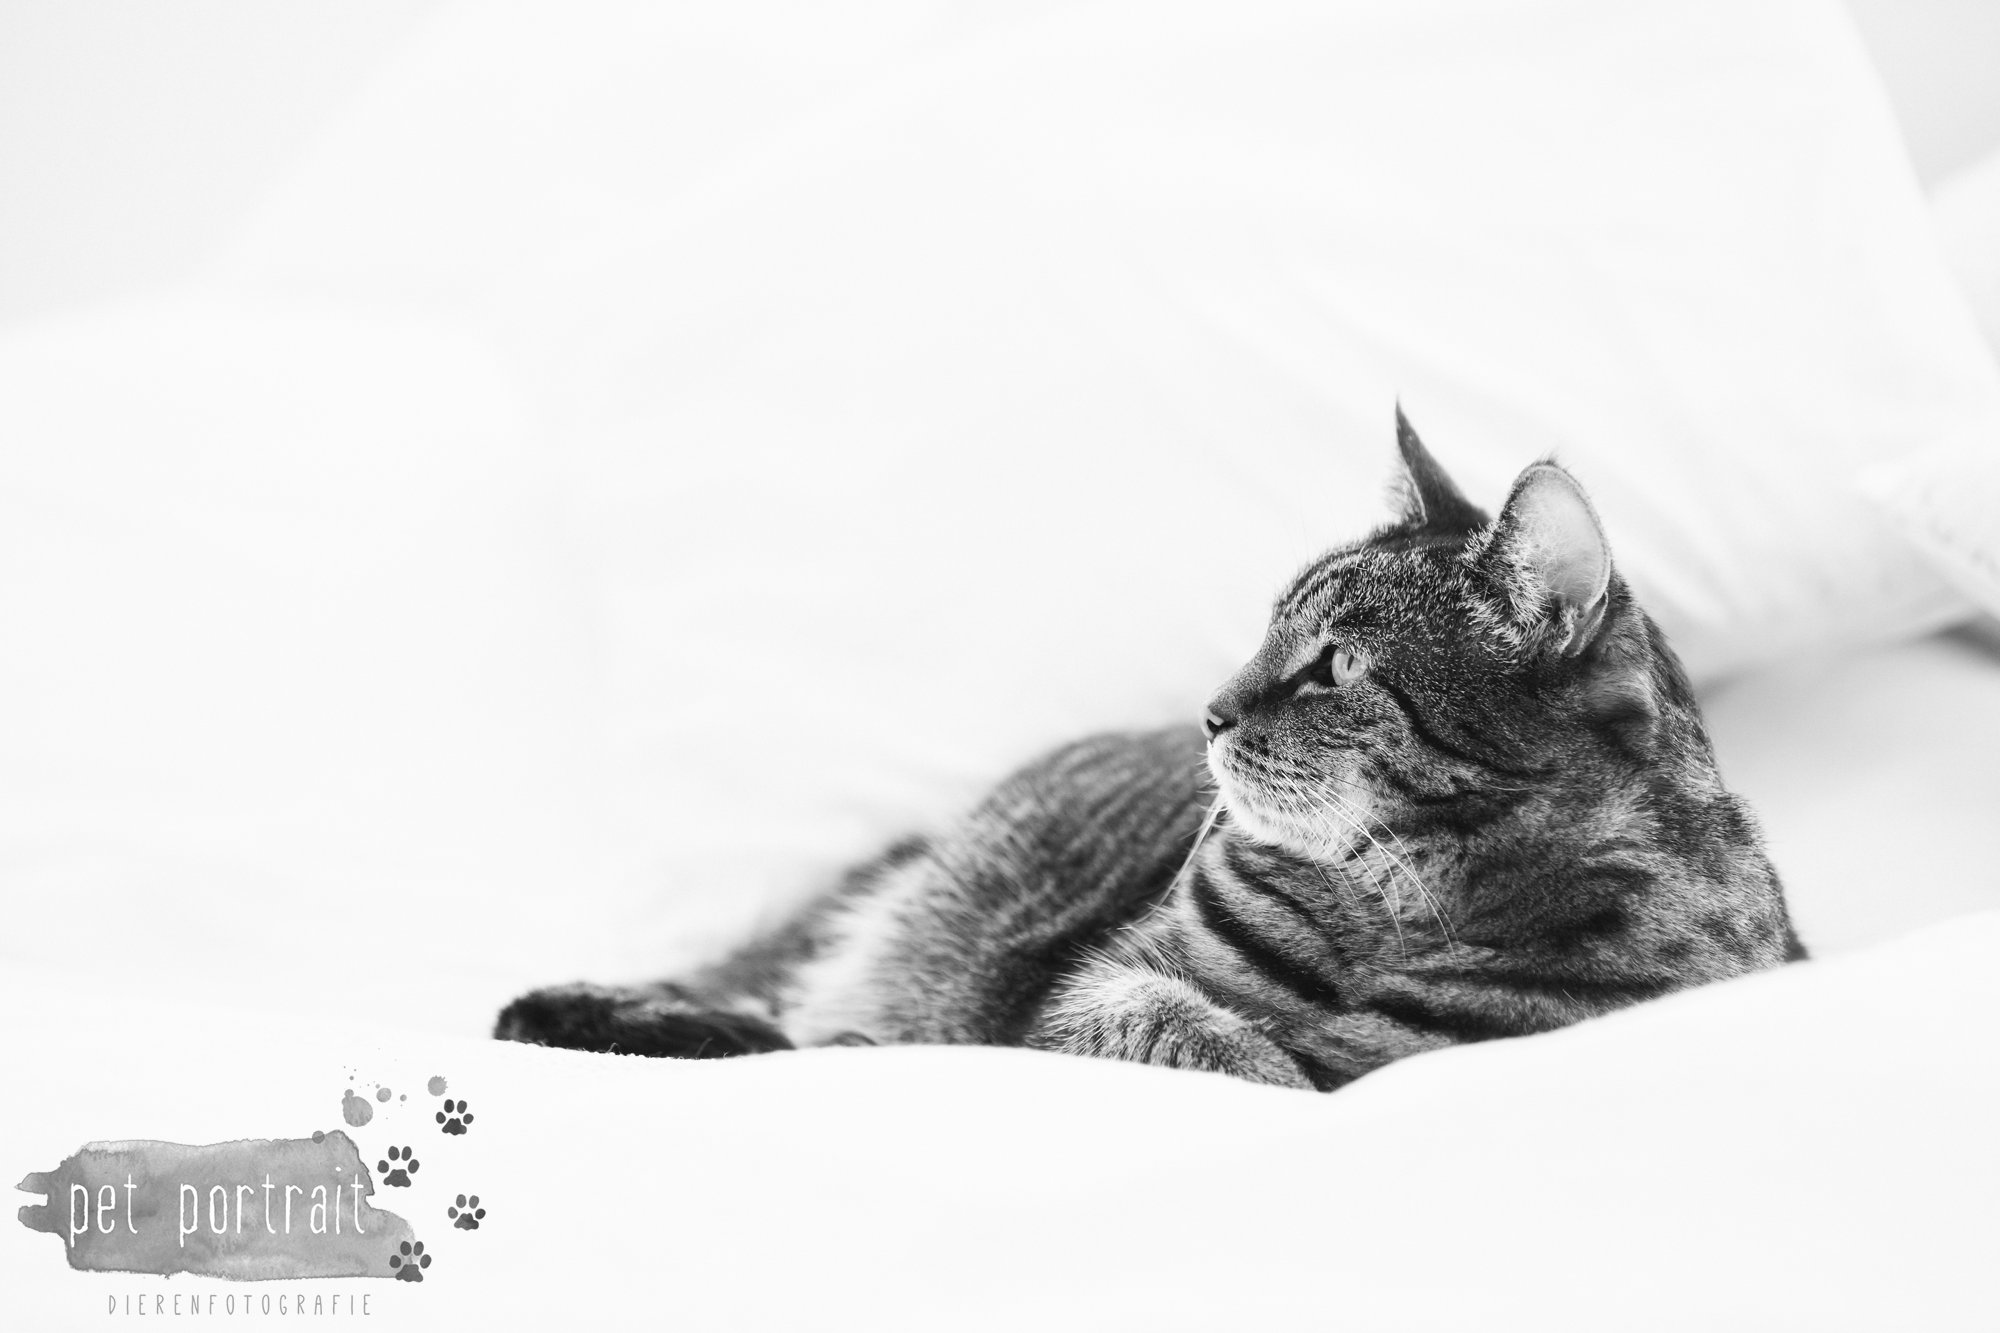 Dierenfotografie Tip - Negatieve ruimte